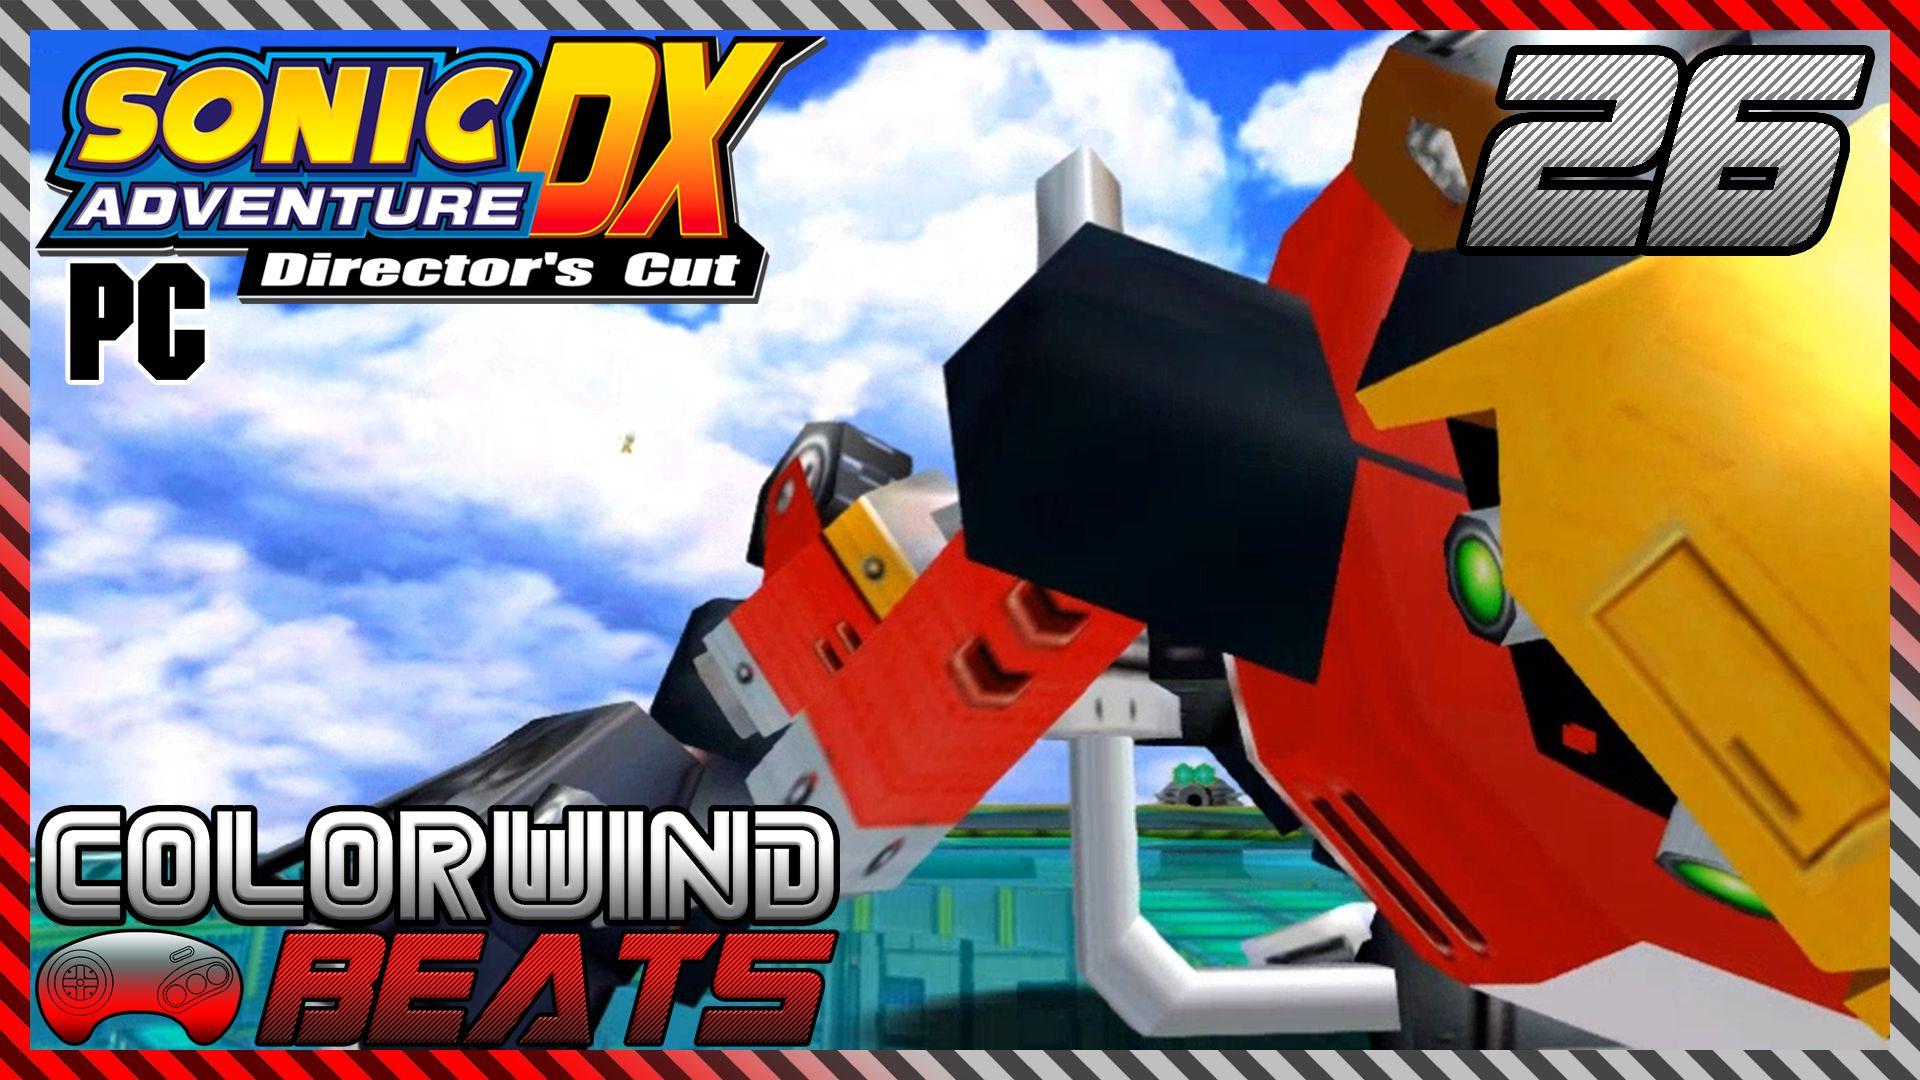 Sonic Adventure DX: Director's Cut (PC) #26